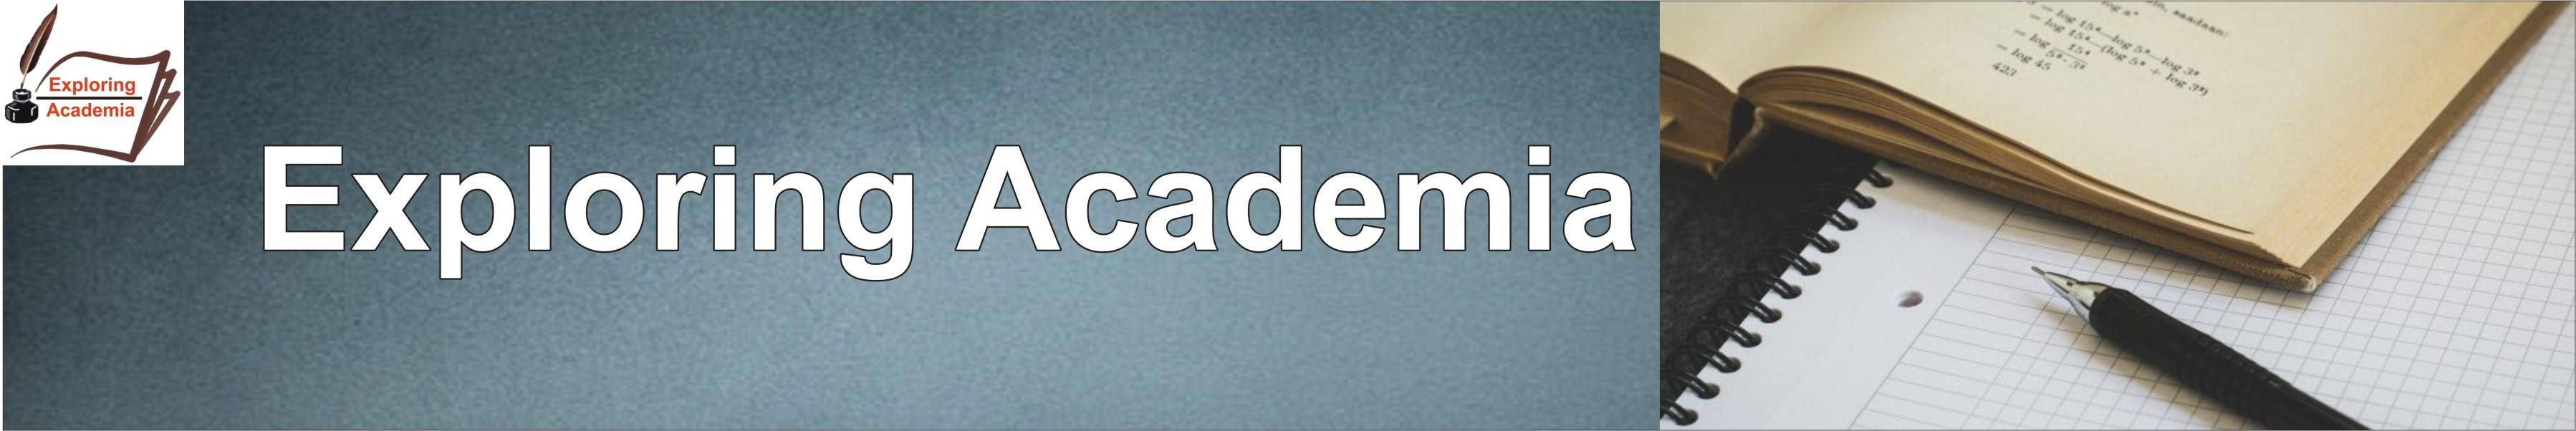 Exploring Academia